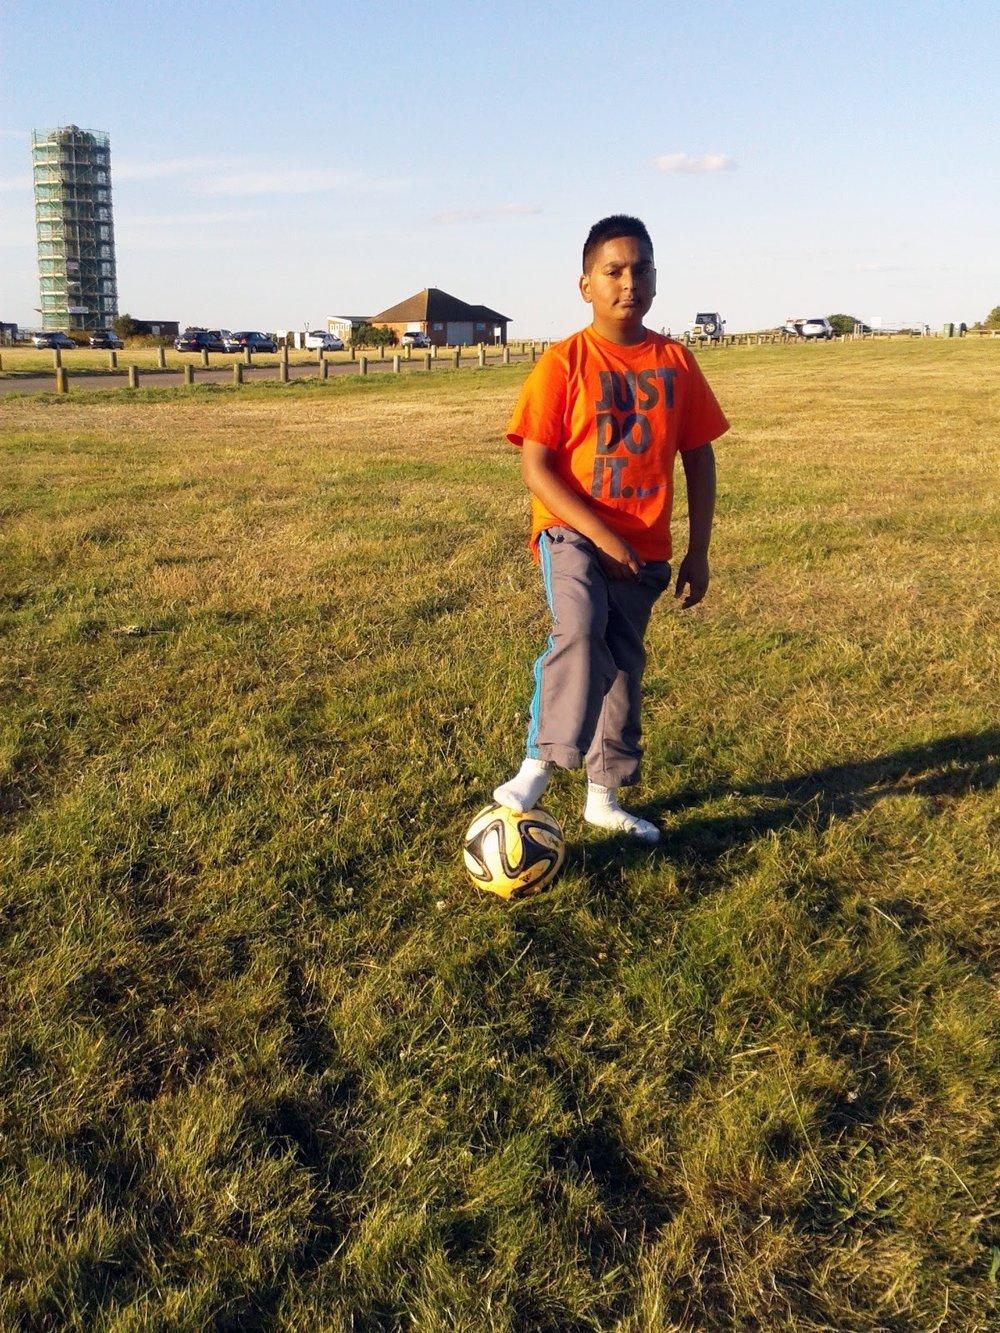 Yaseer playing football